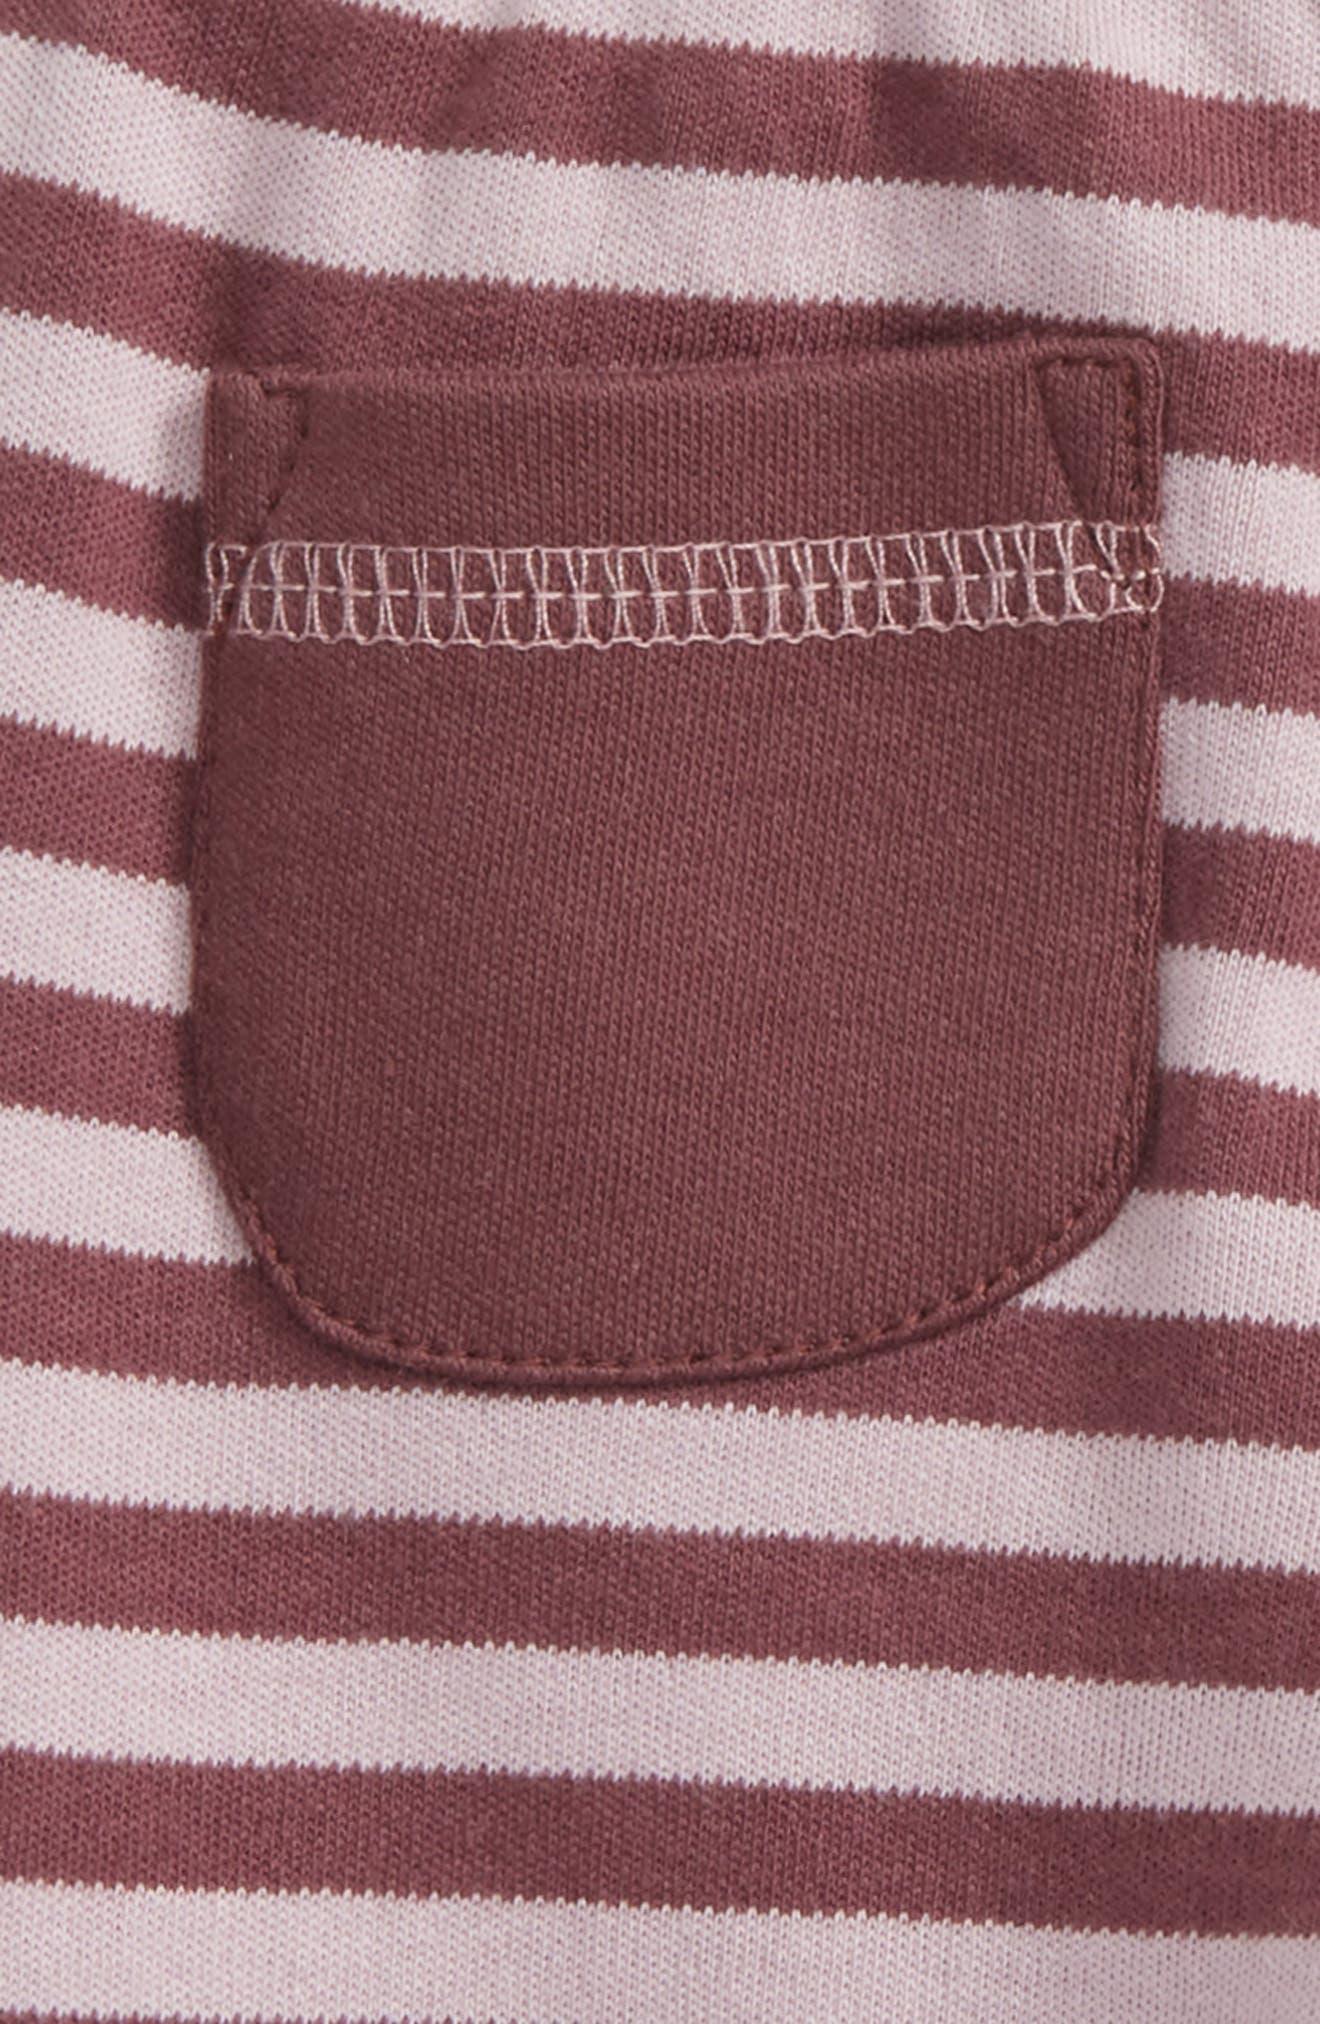 Organic Cotton Jogger Pants,                             Alternate thumbnail 3, color,                             500